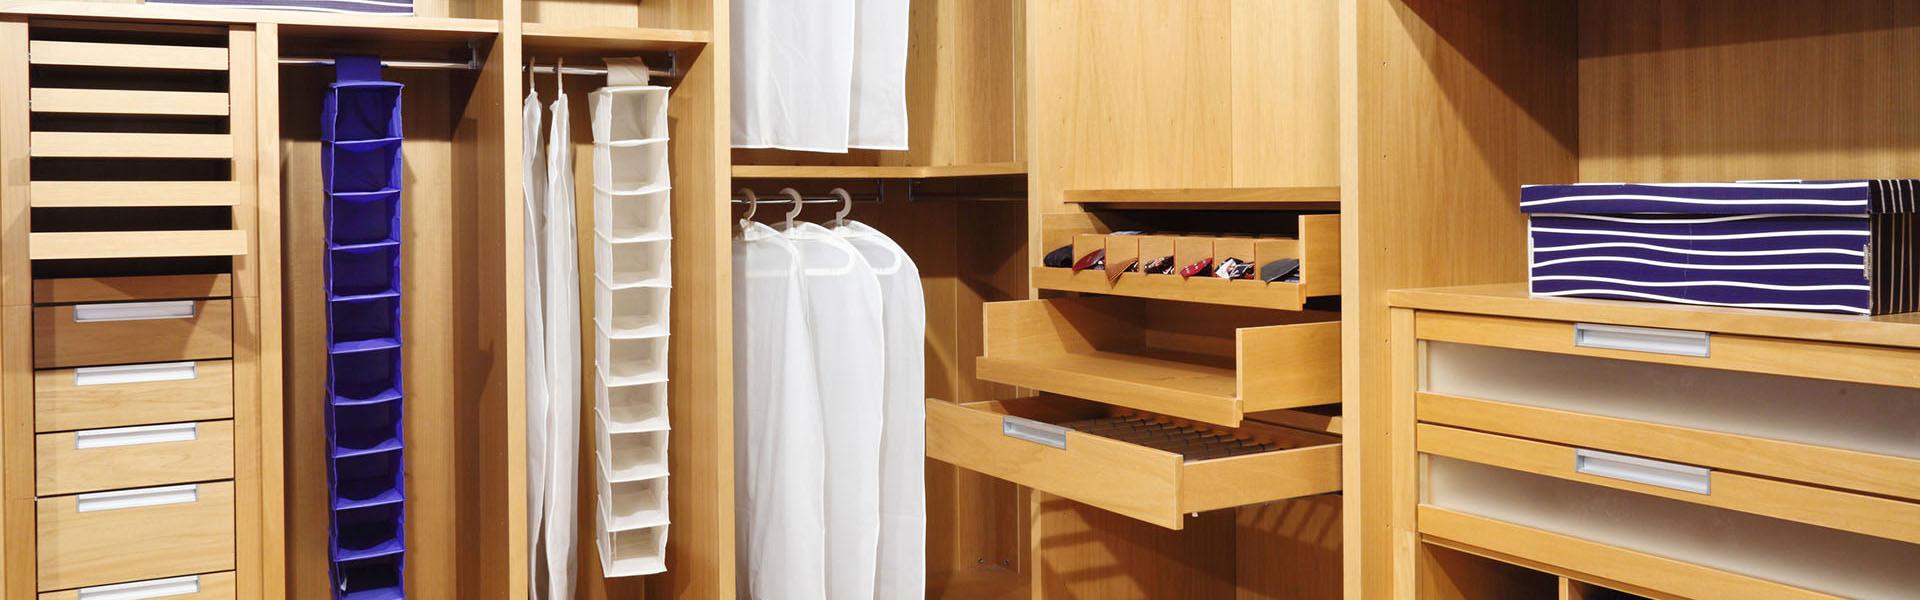 closet systems naples fotolia garage cabinets